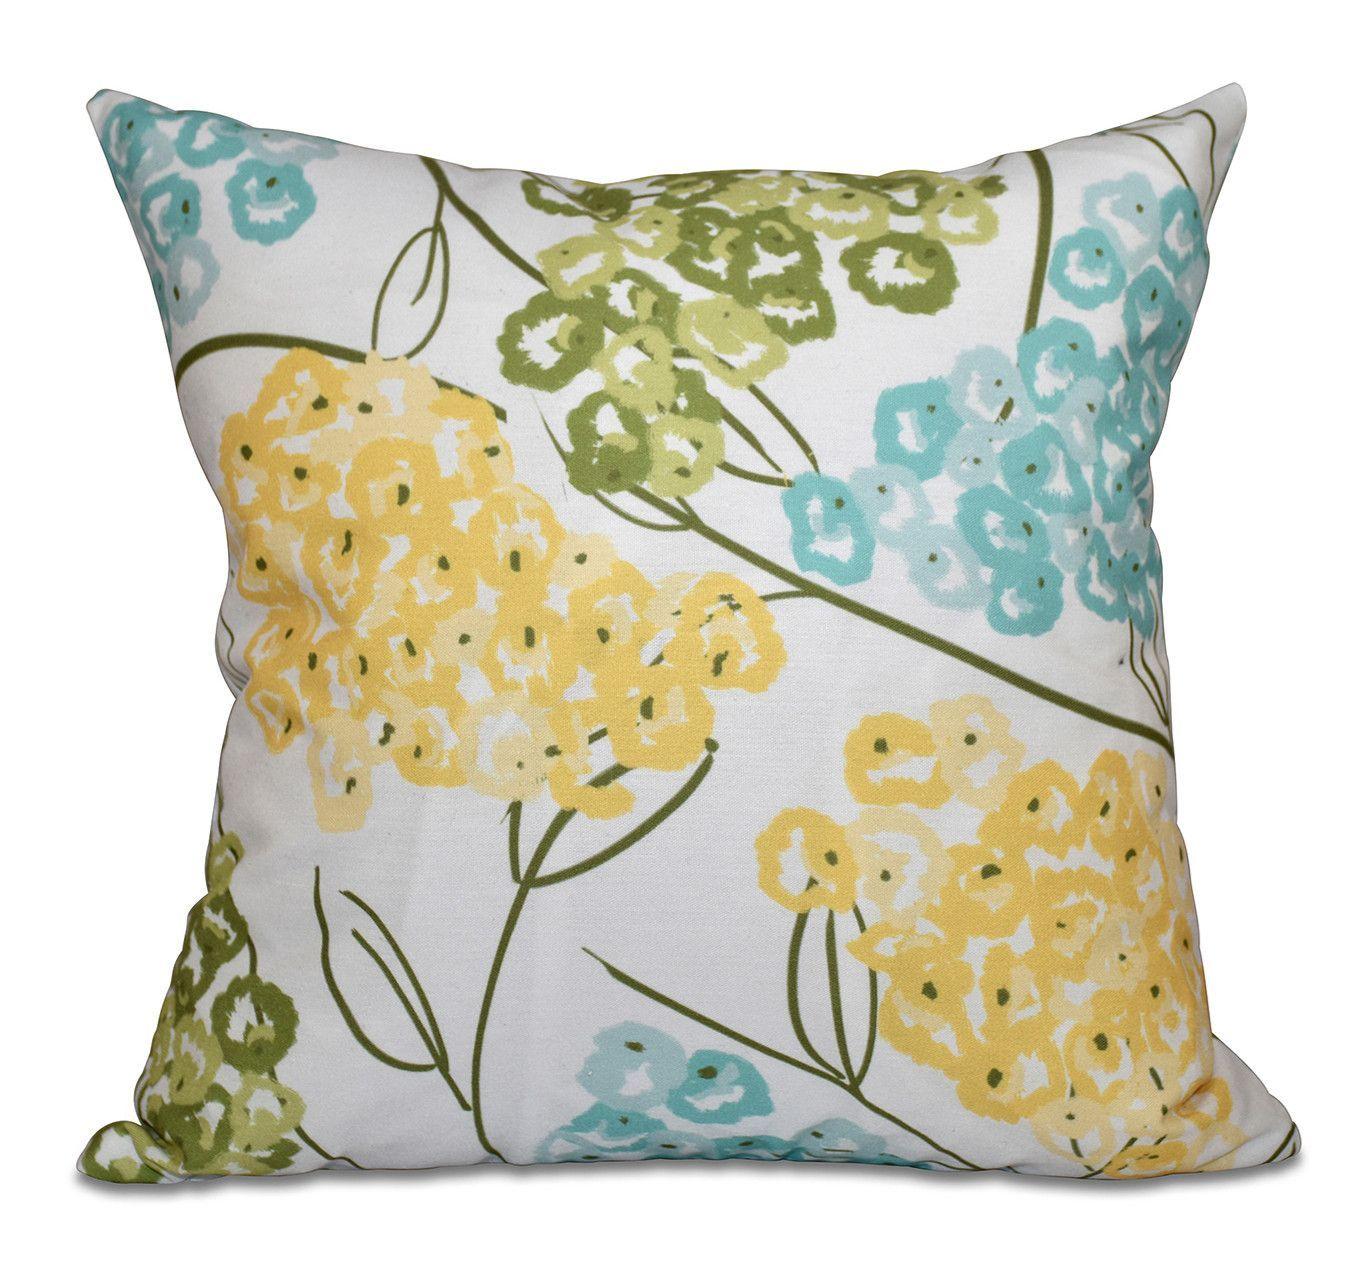 Chenango hydrangeas floral print outdoor throw pillow outdoor